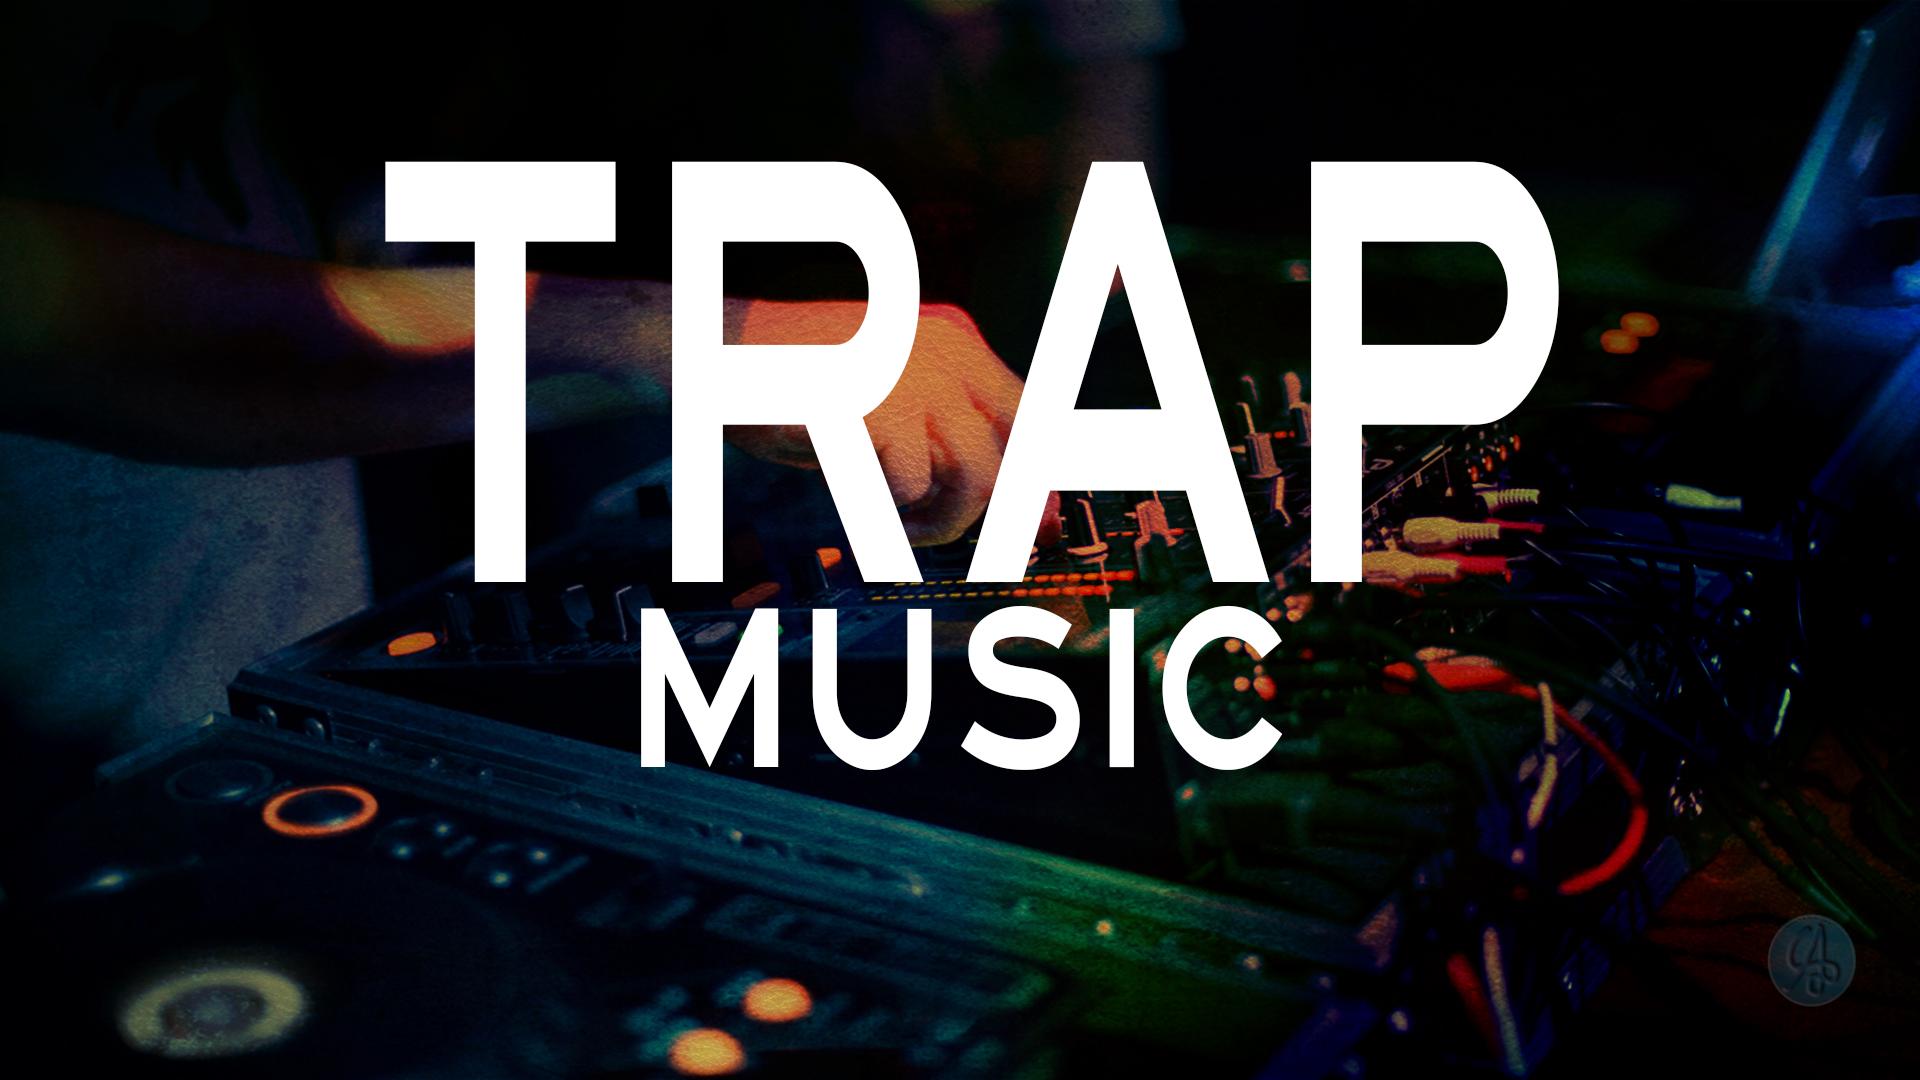 Trap Music Wallpaper By AJ8-AcRo On DeviantArt